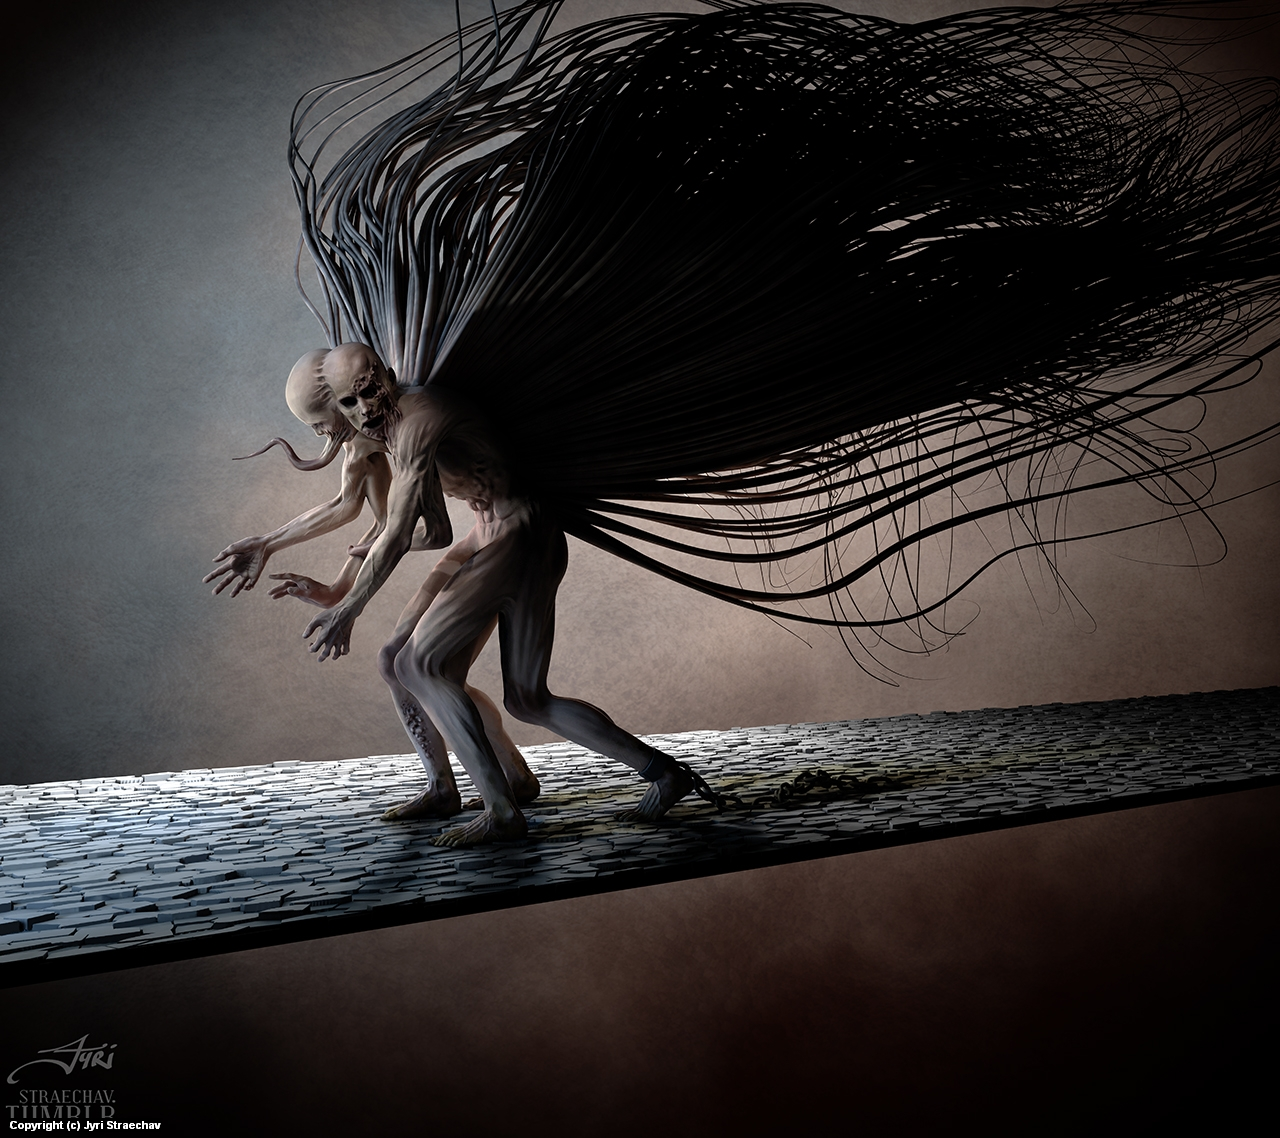 The Wretched Artwork by Jyri Straechav